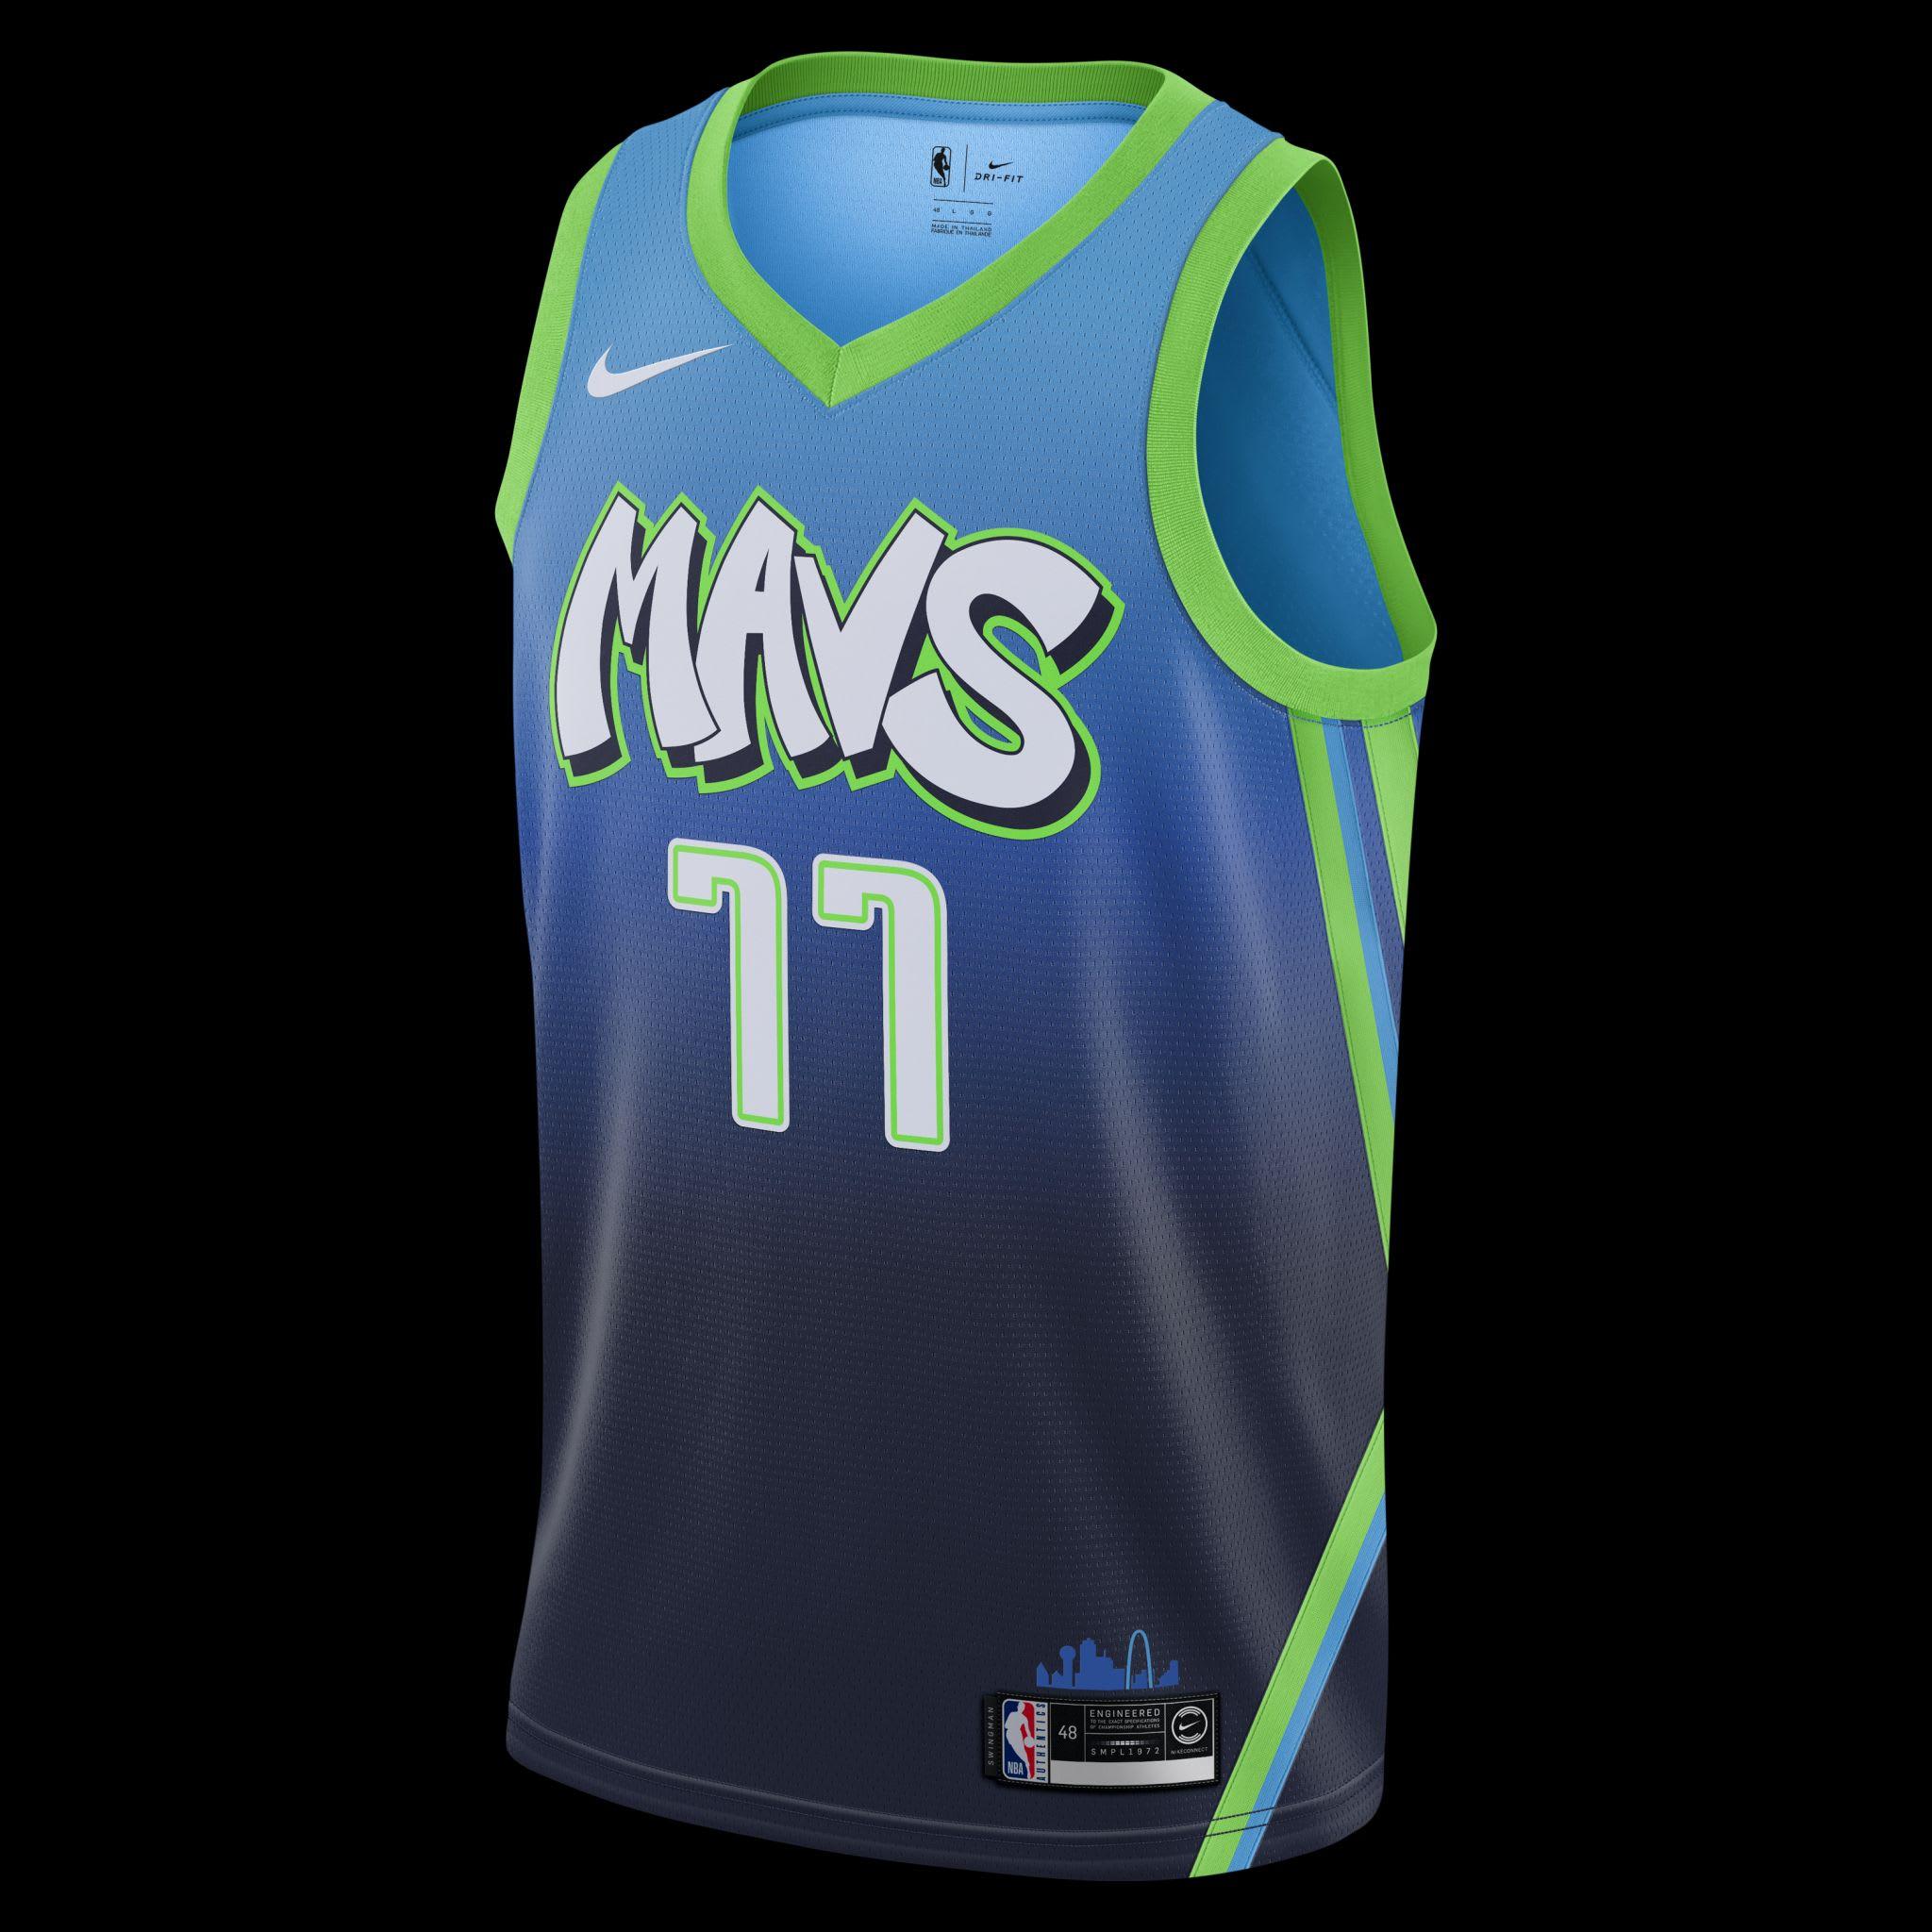 dallas mavericks nike jersey